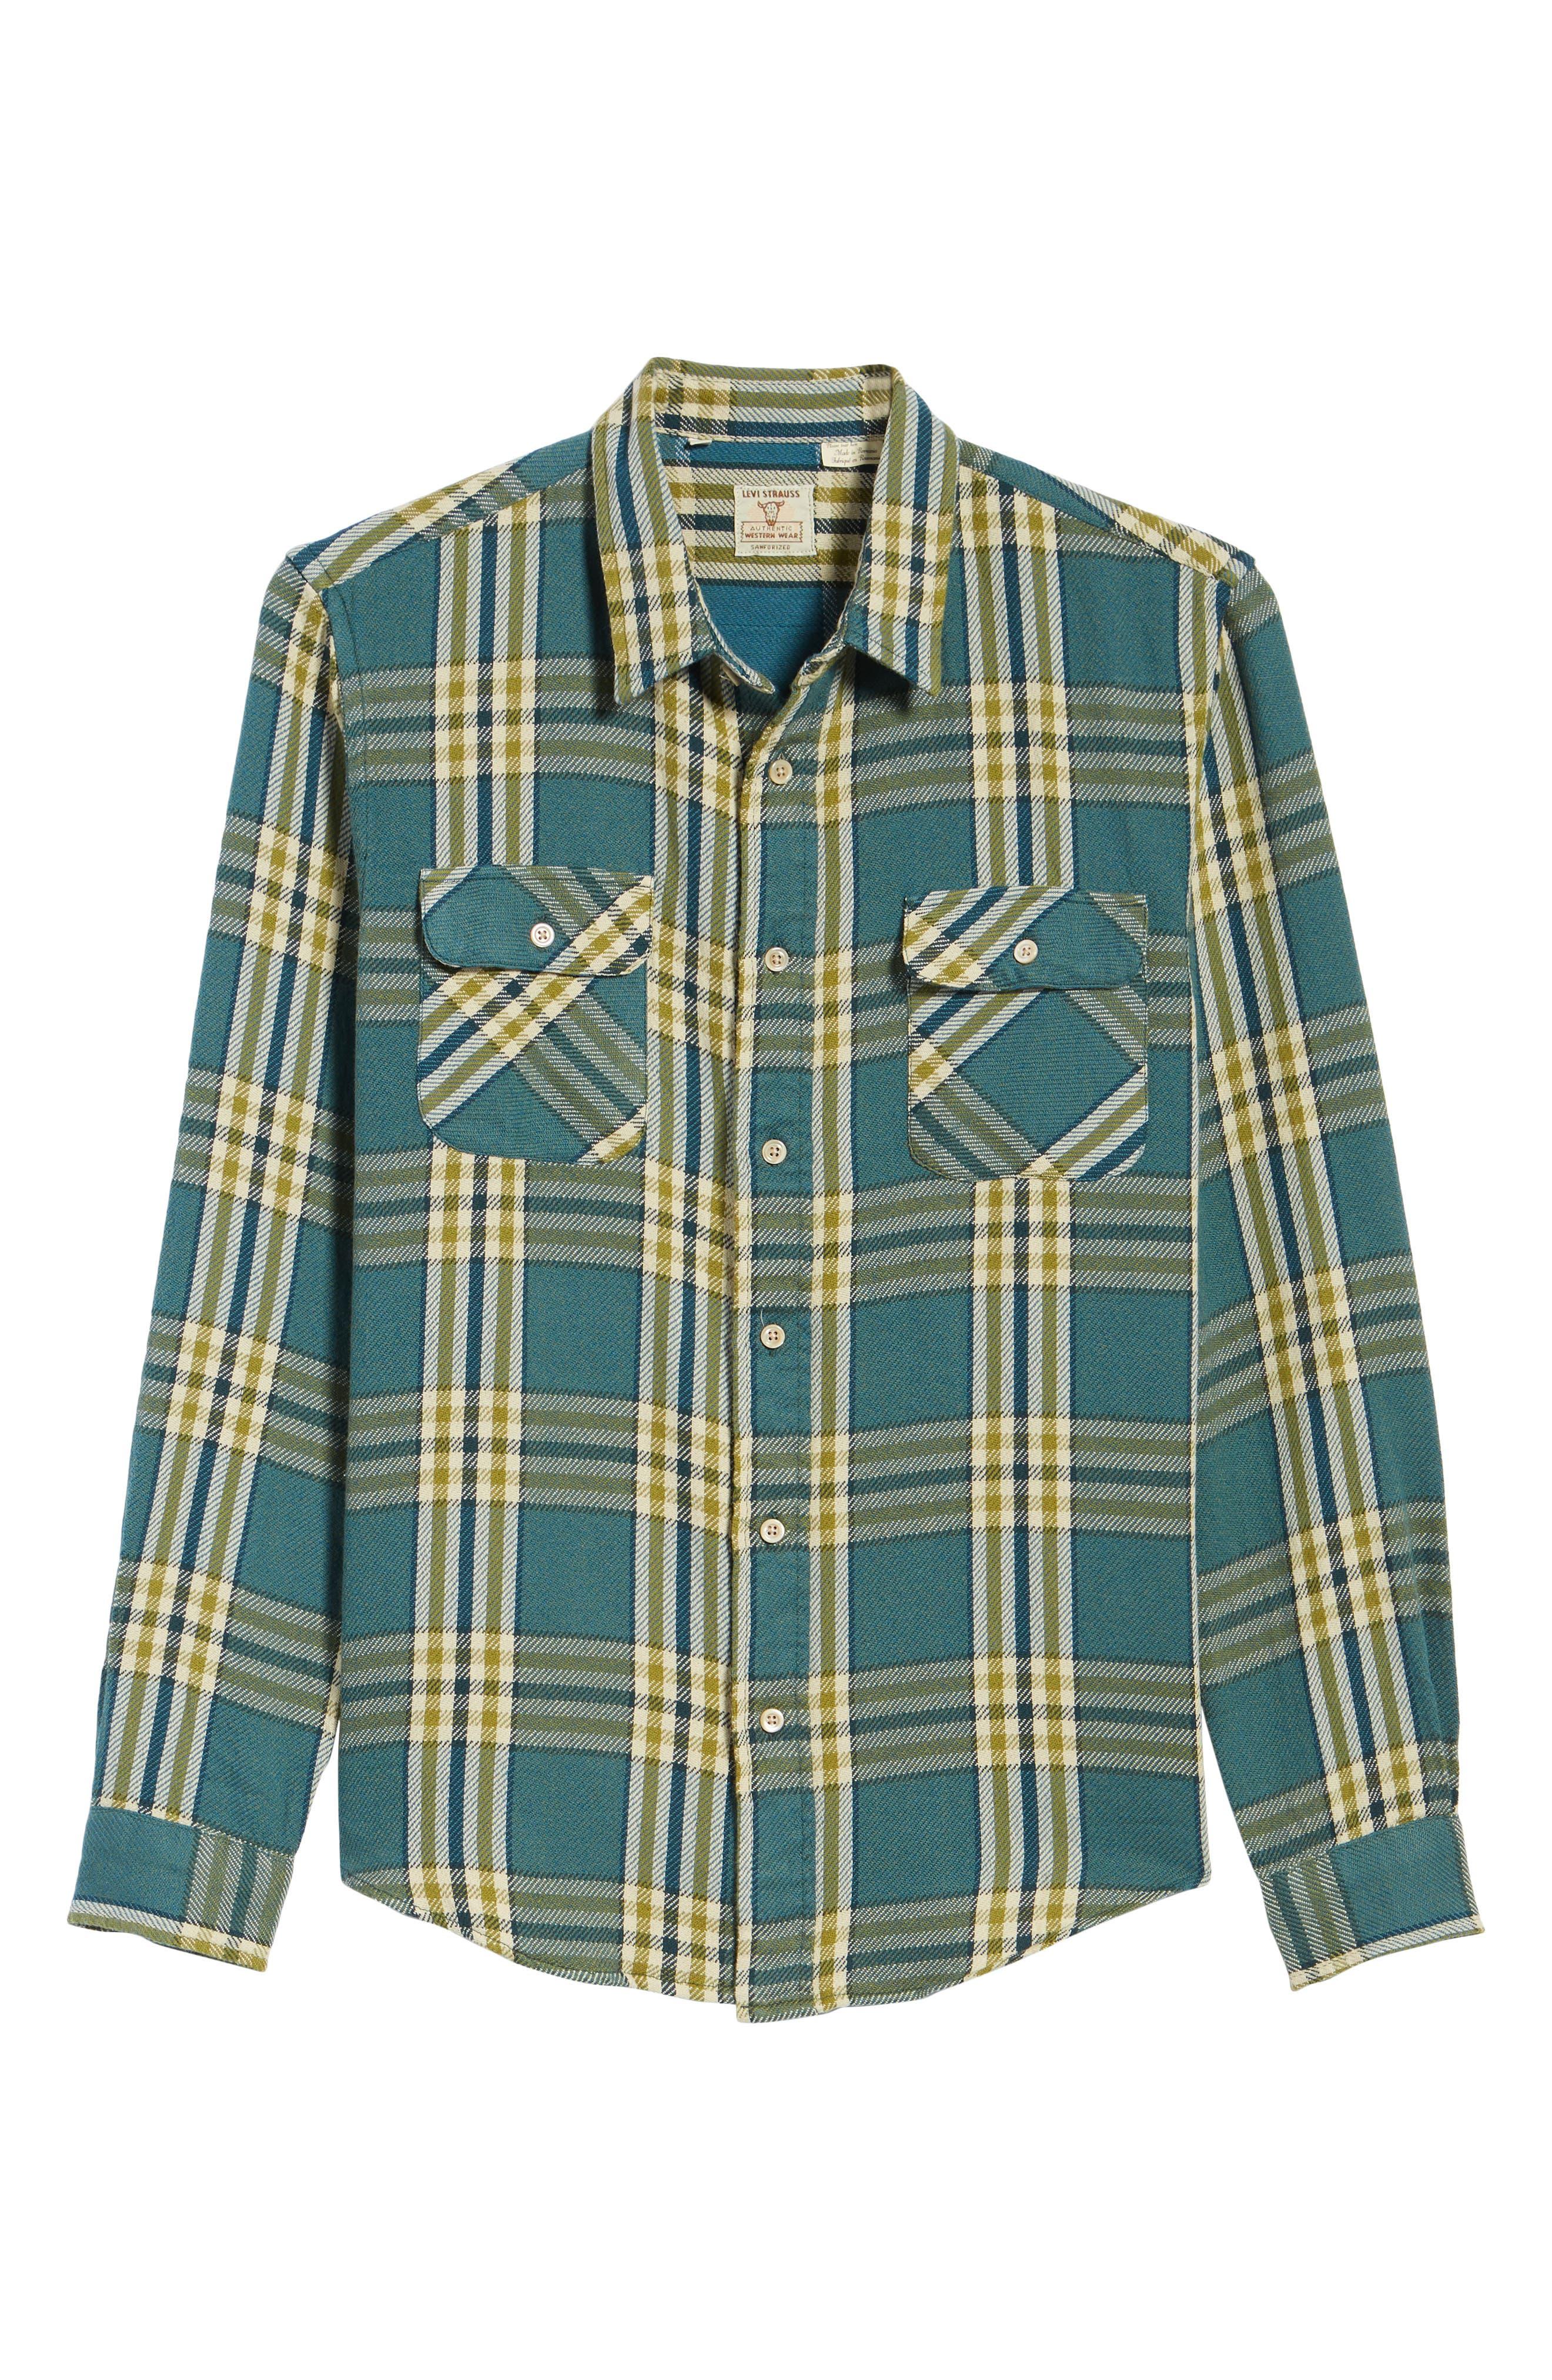 Shorthorn Western Shirt,                             Alternate thumbnail 6, color,                             400